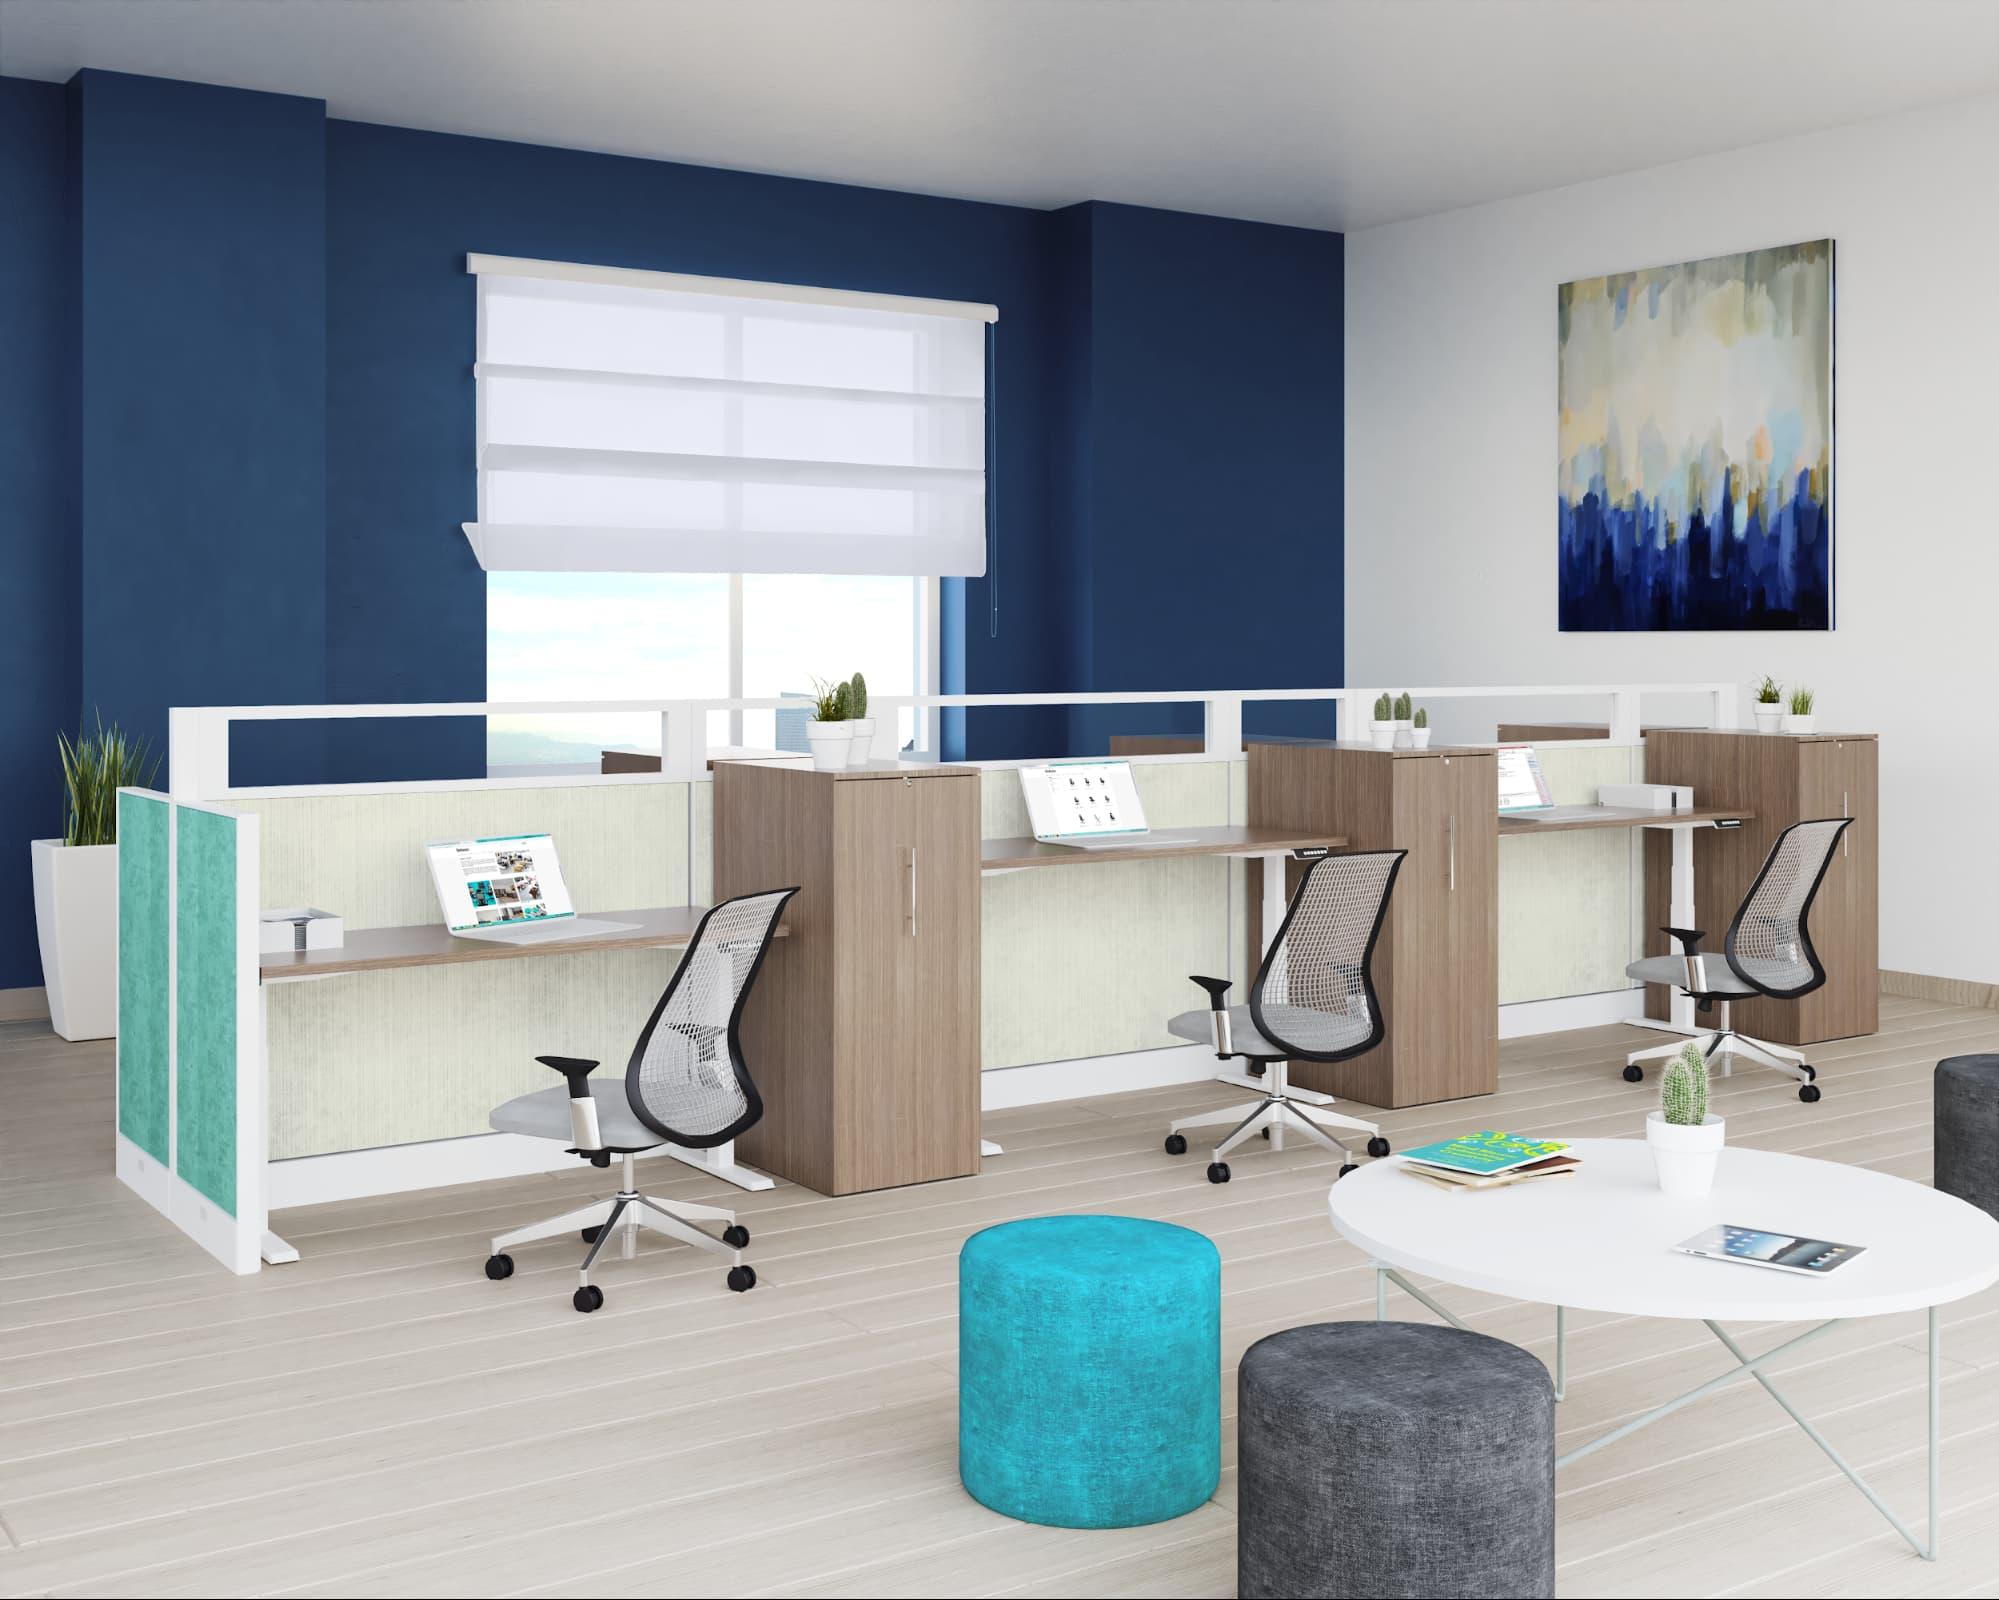 escritorios-de-altura-ajustable-ascend